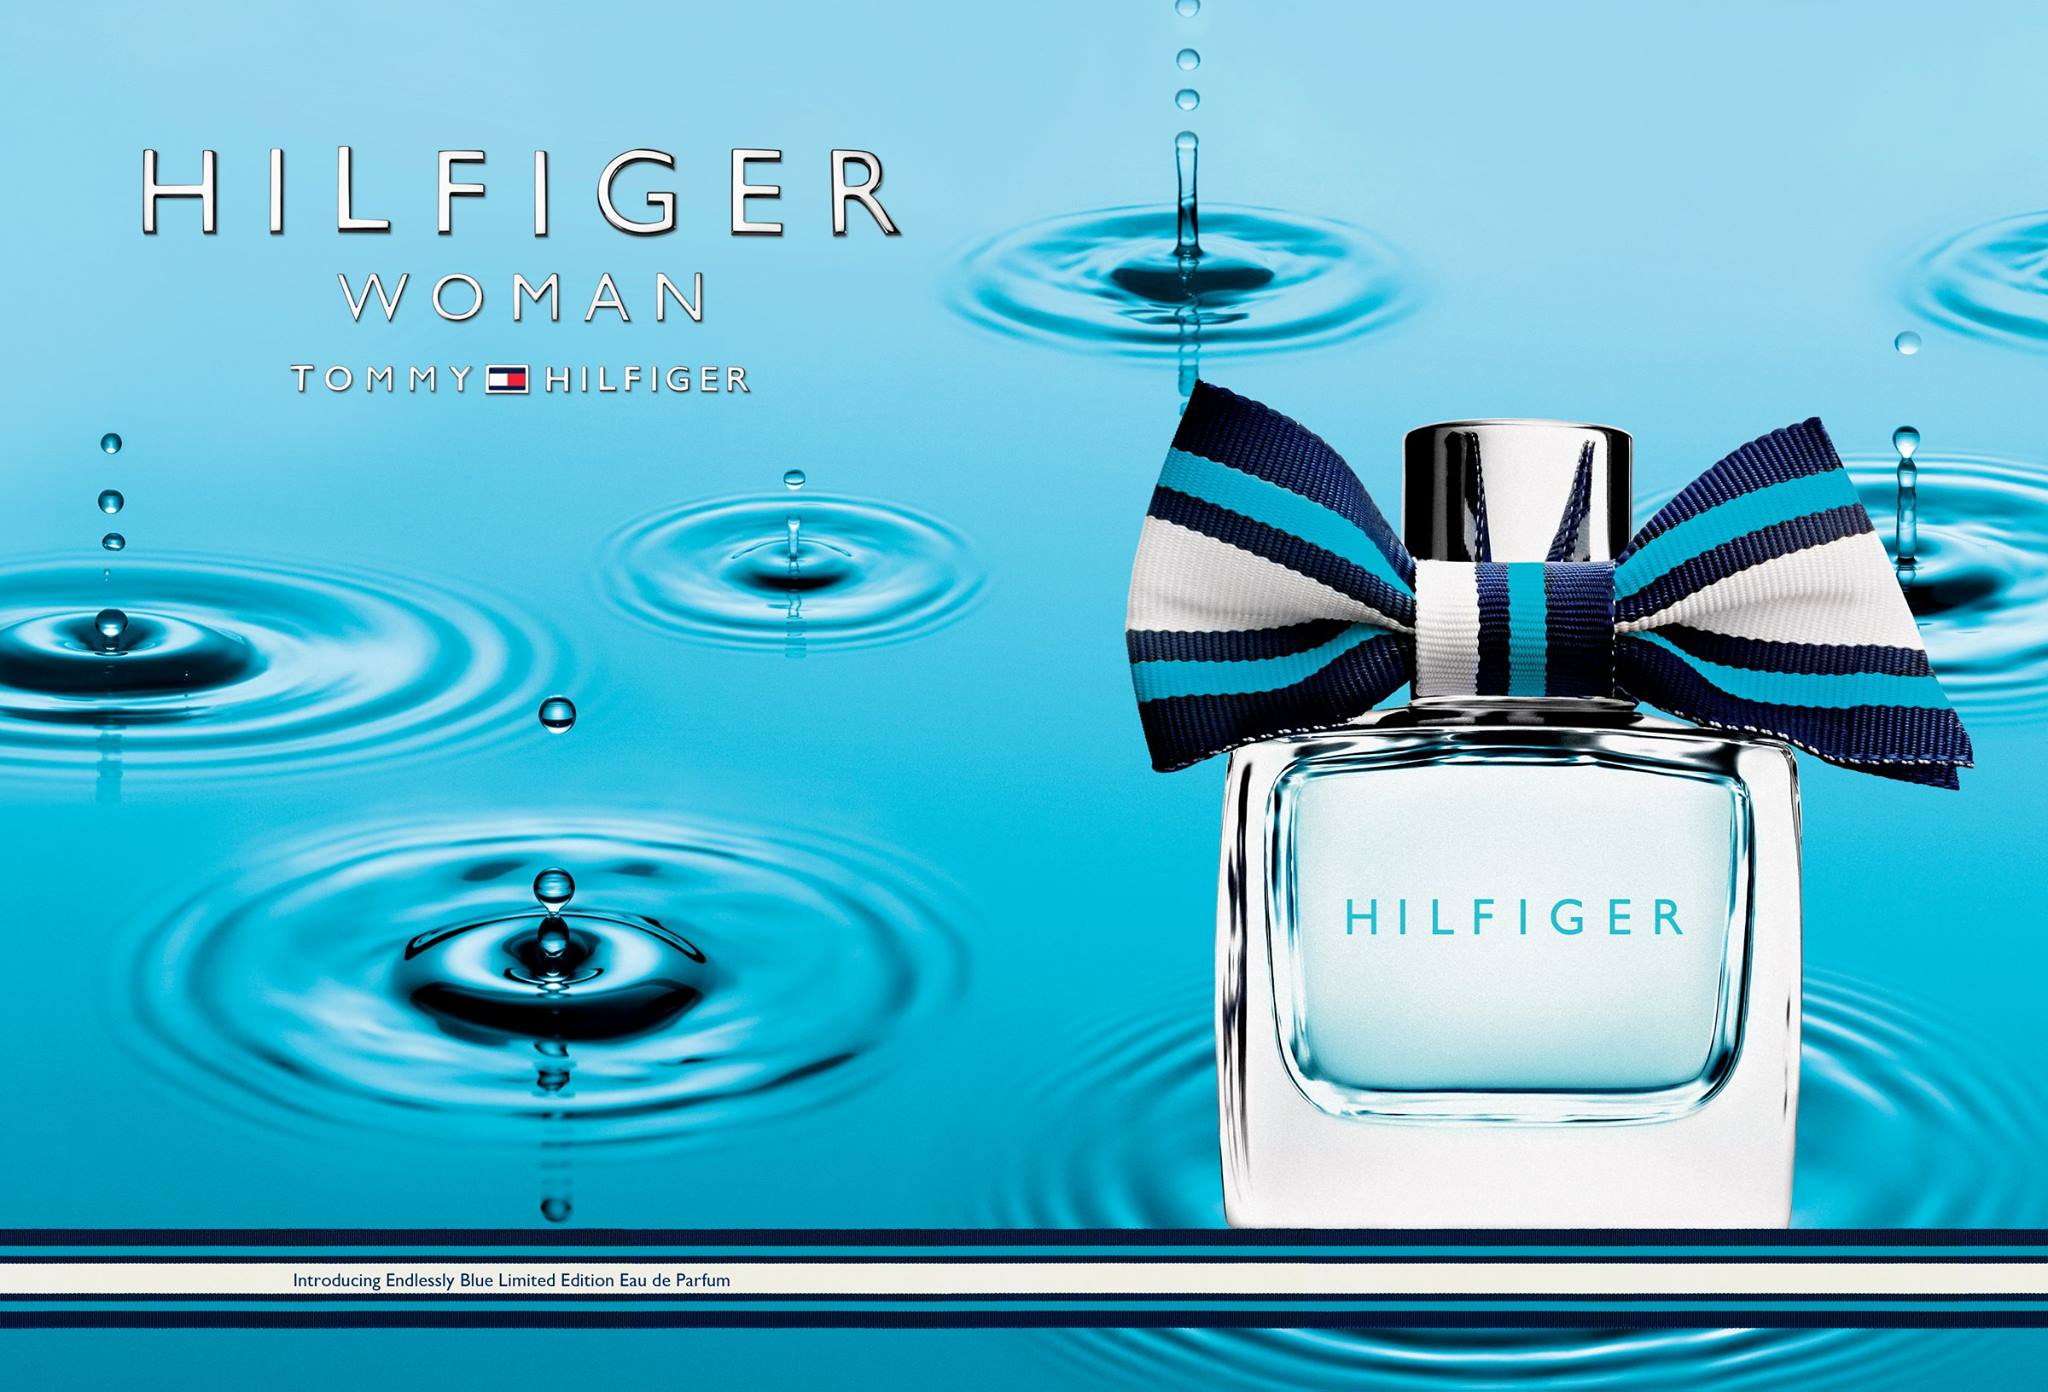 bfb95702 Hilfiger Woman Endlessly Blue Tommy Hilfiger perfume - a fragrance ...